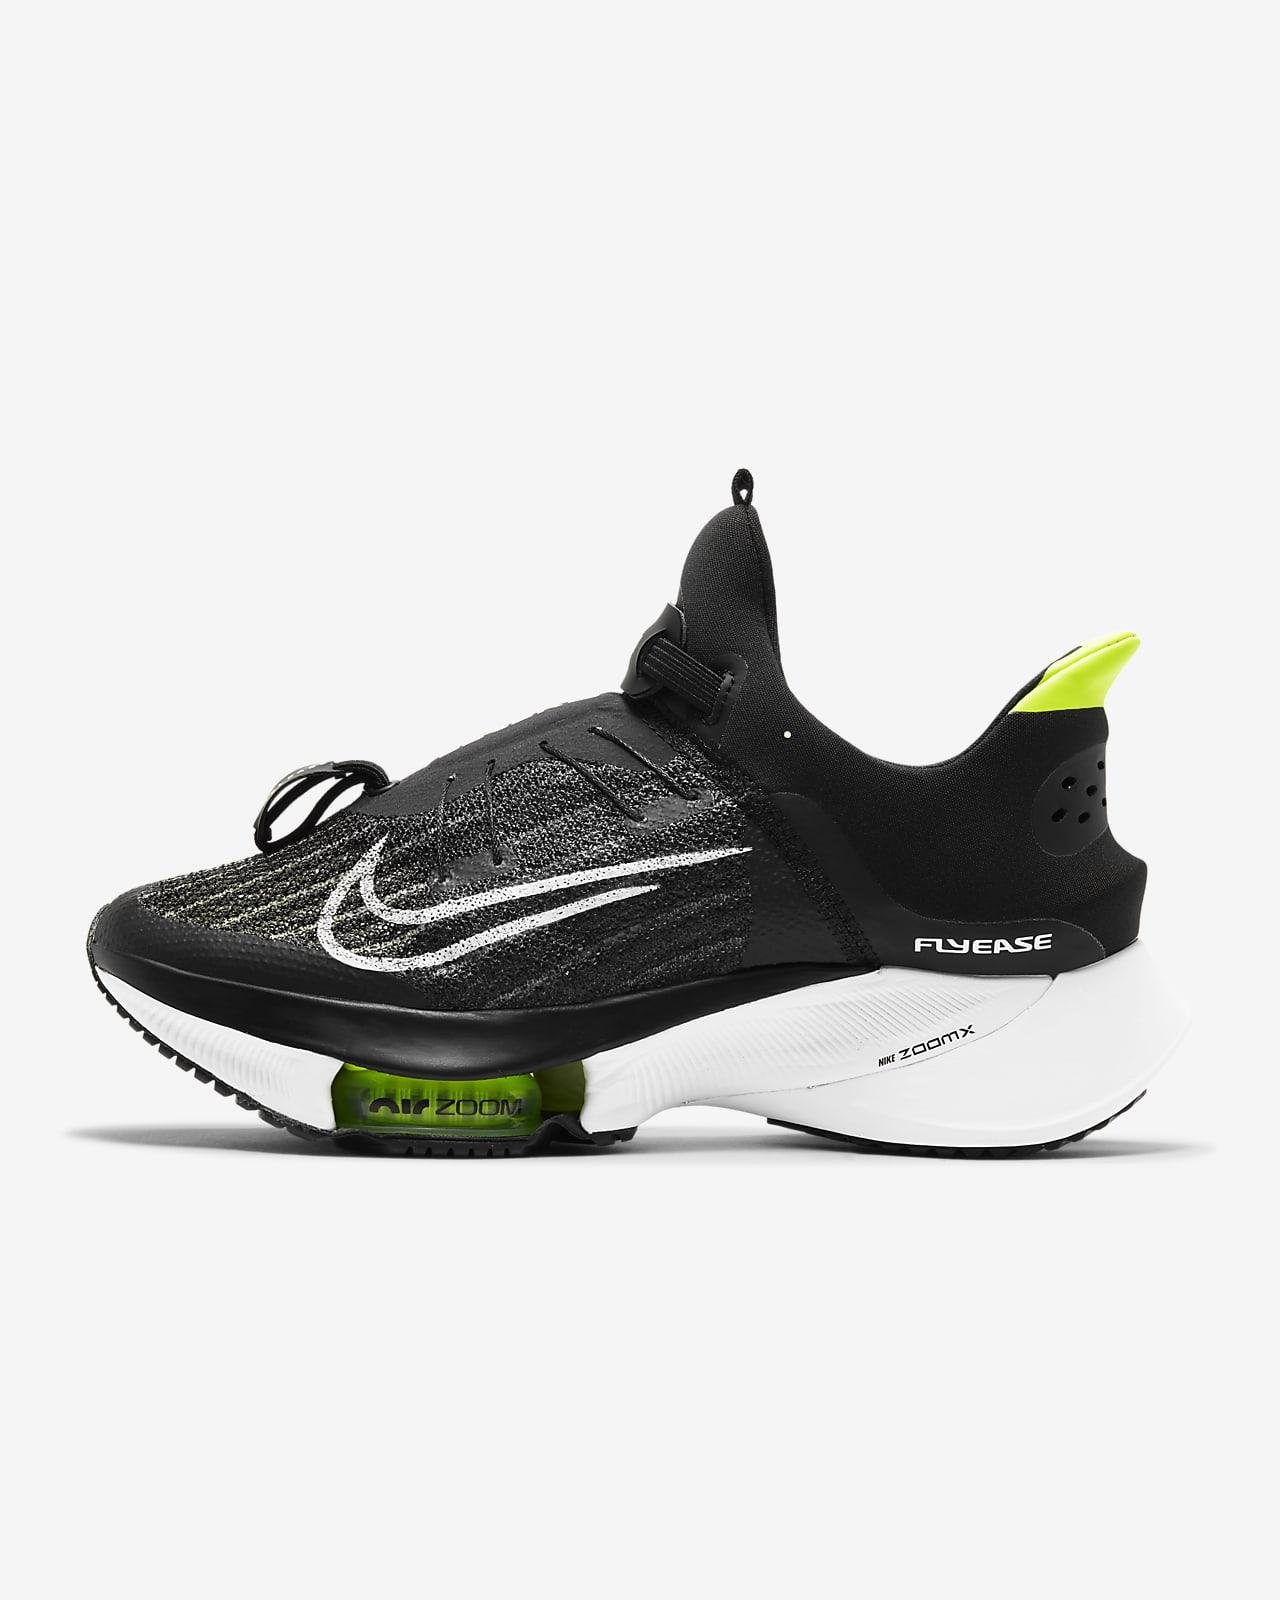 Nike Air Zoom Tempo NEXT% FlyEase Women's Running Shoe